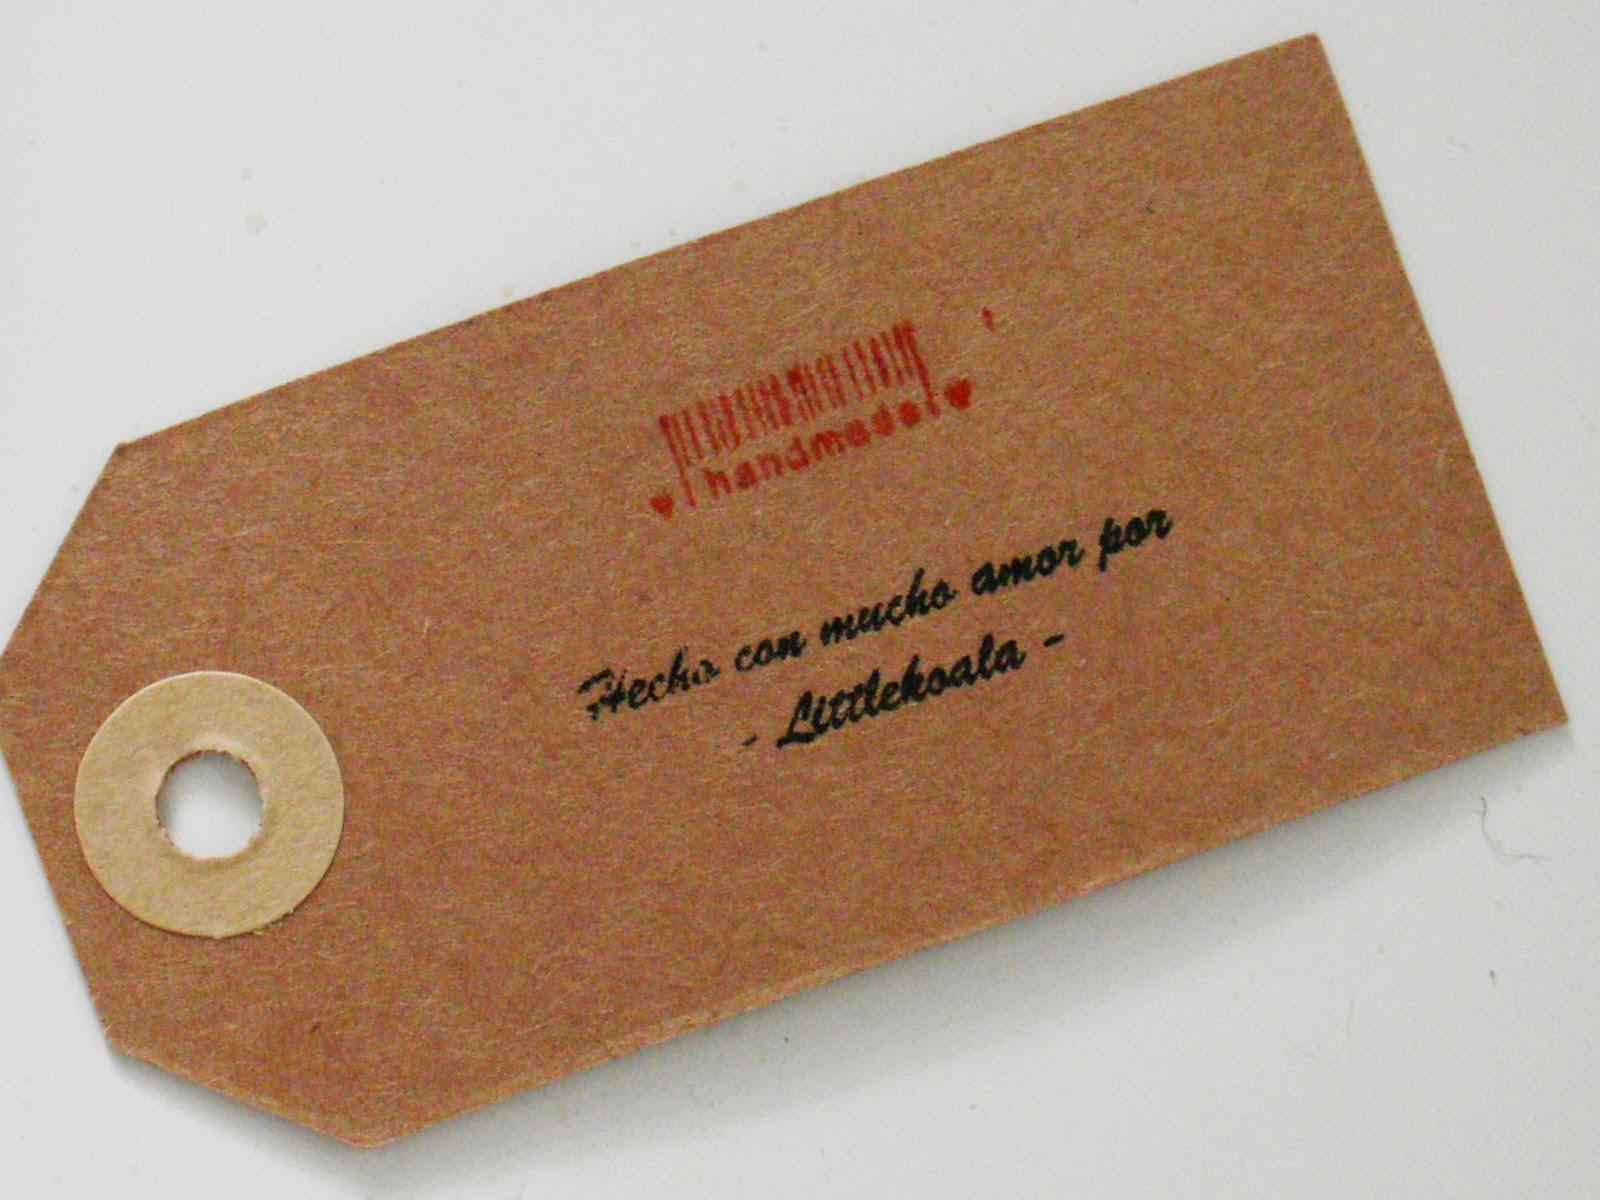 http://littlekoala82.blogspot.com.es/2014/05/sellos-personalizados-baratos.html